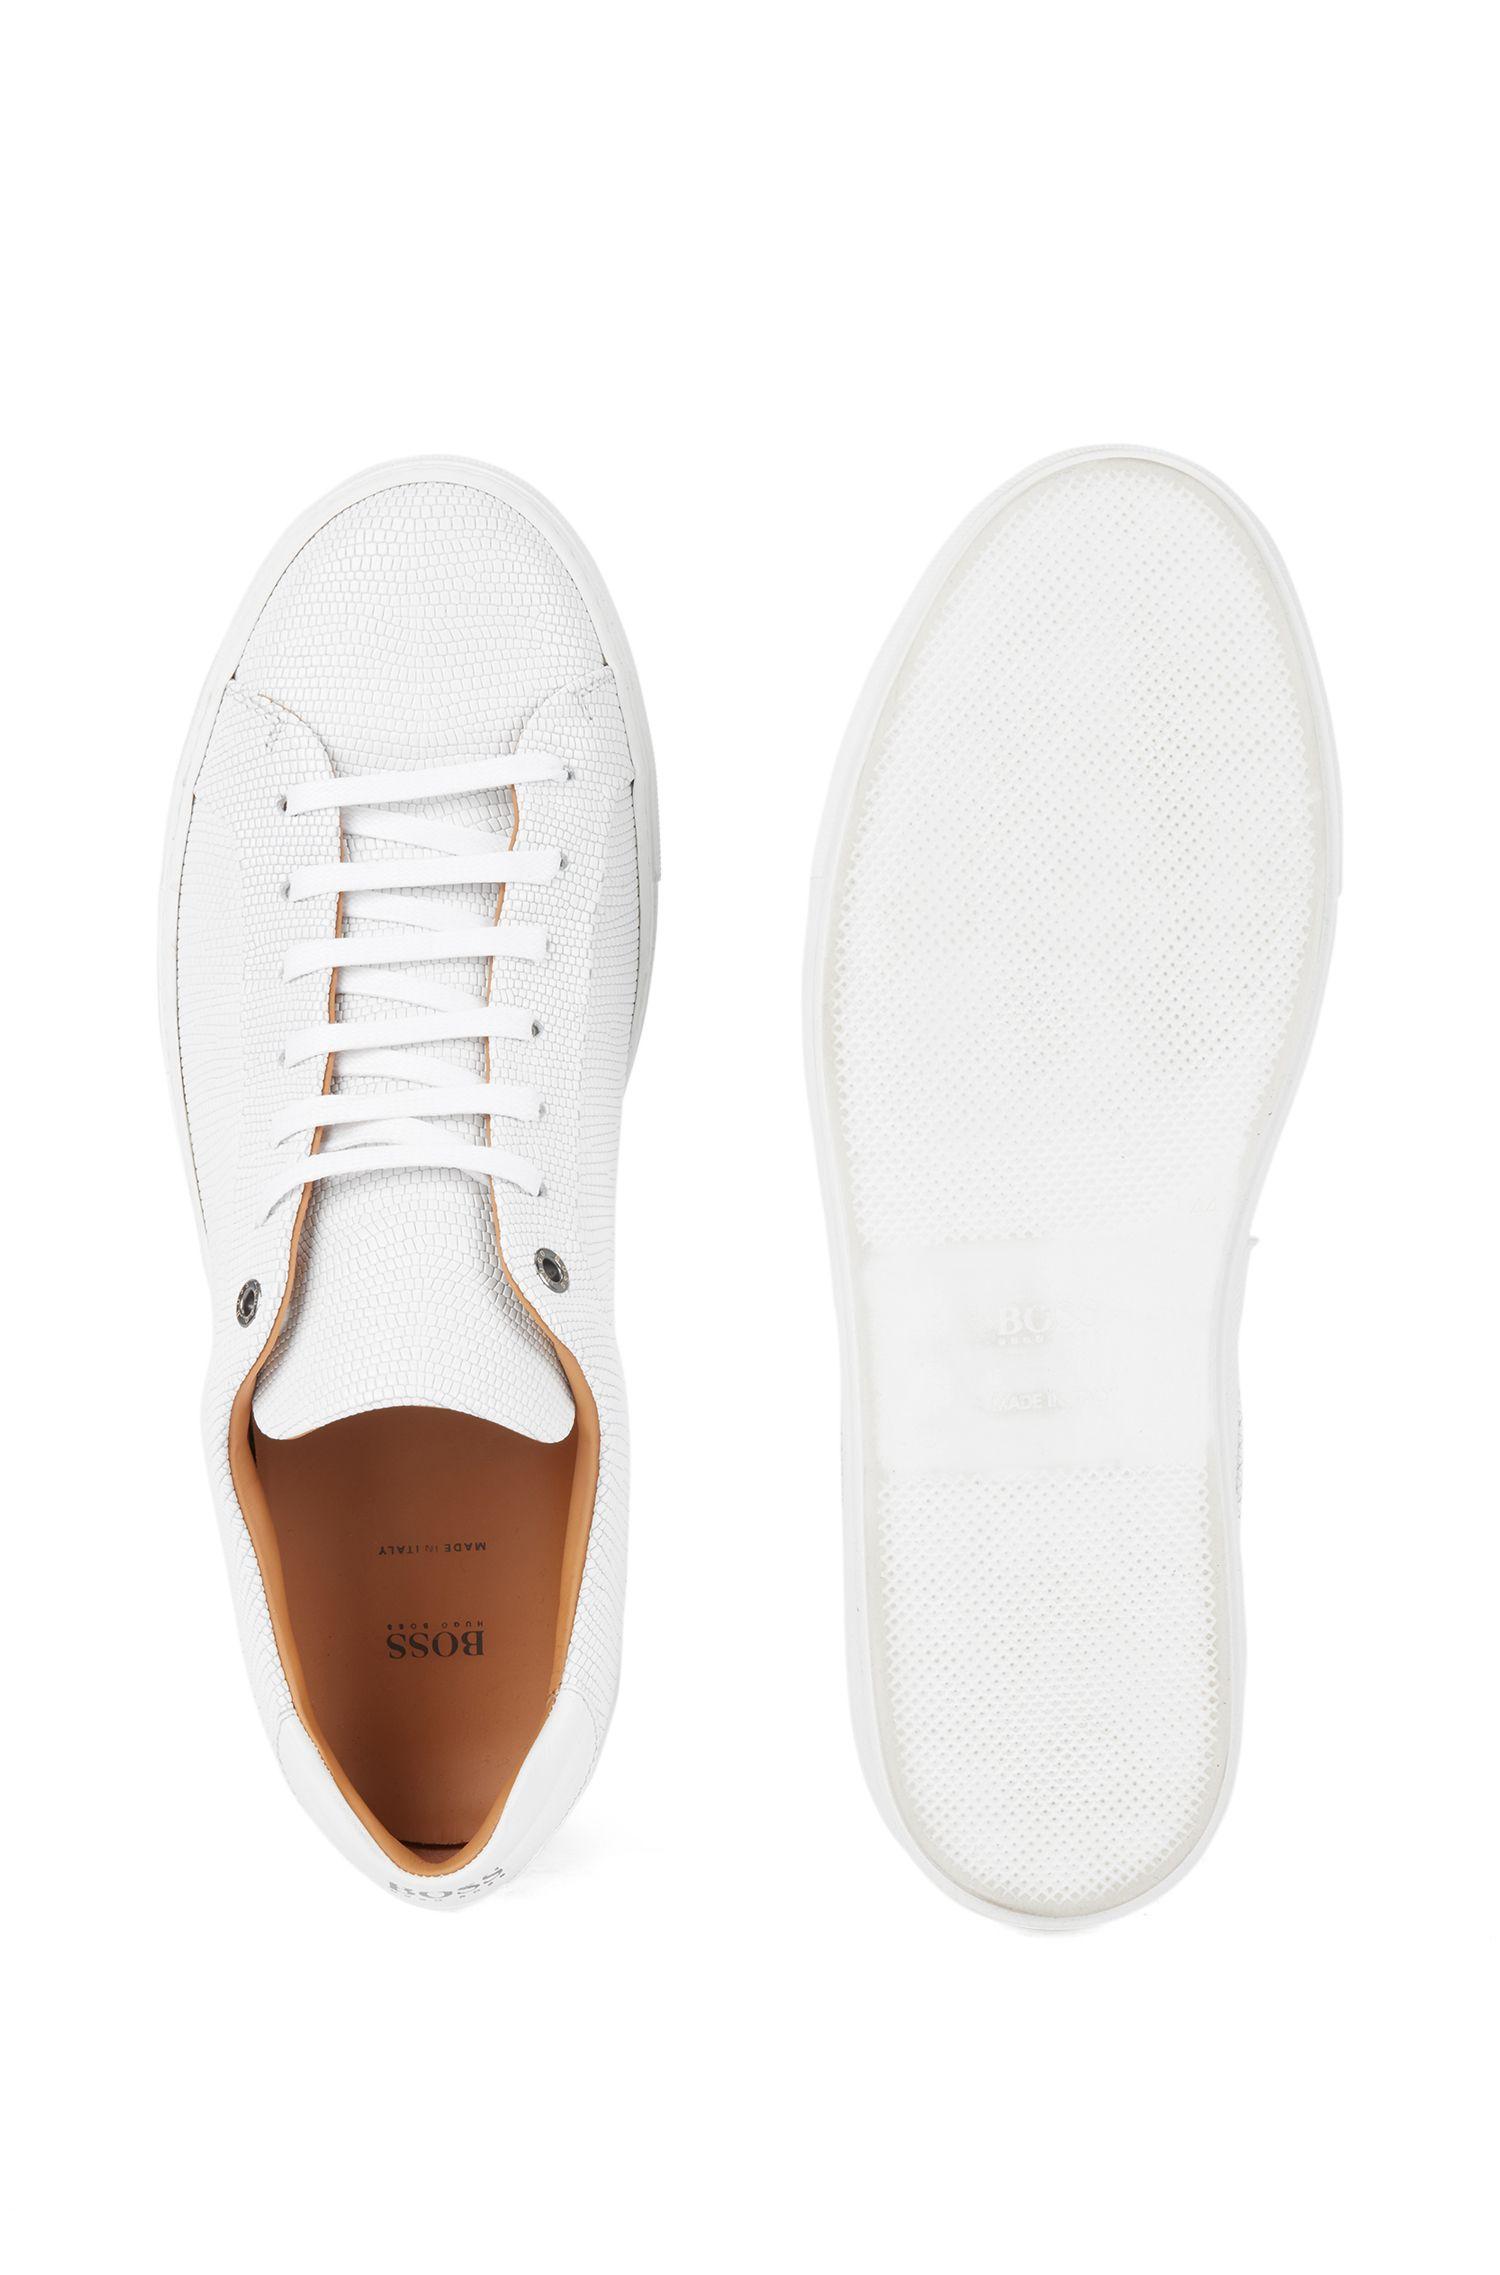 Sneakers aus geprägtem Leder im Tennis-Stil, Weiß